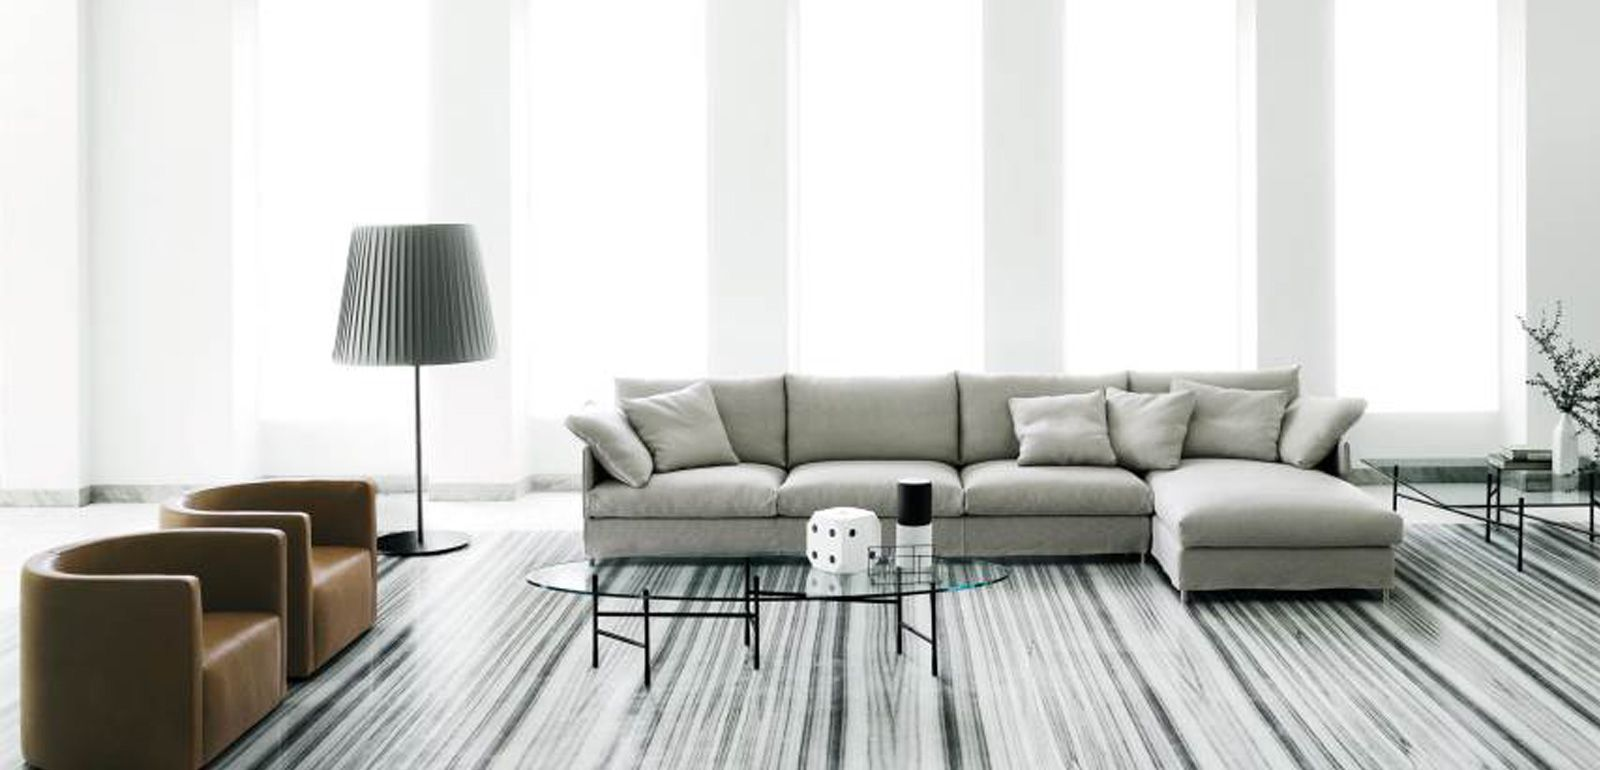 Designer Furniture For Home Lighting Lamps Sofa Silvera